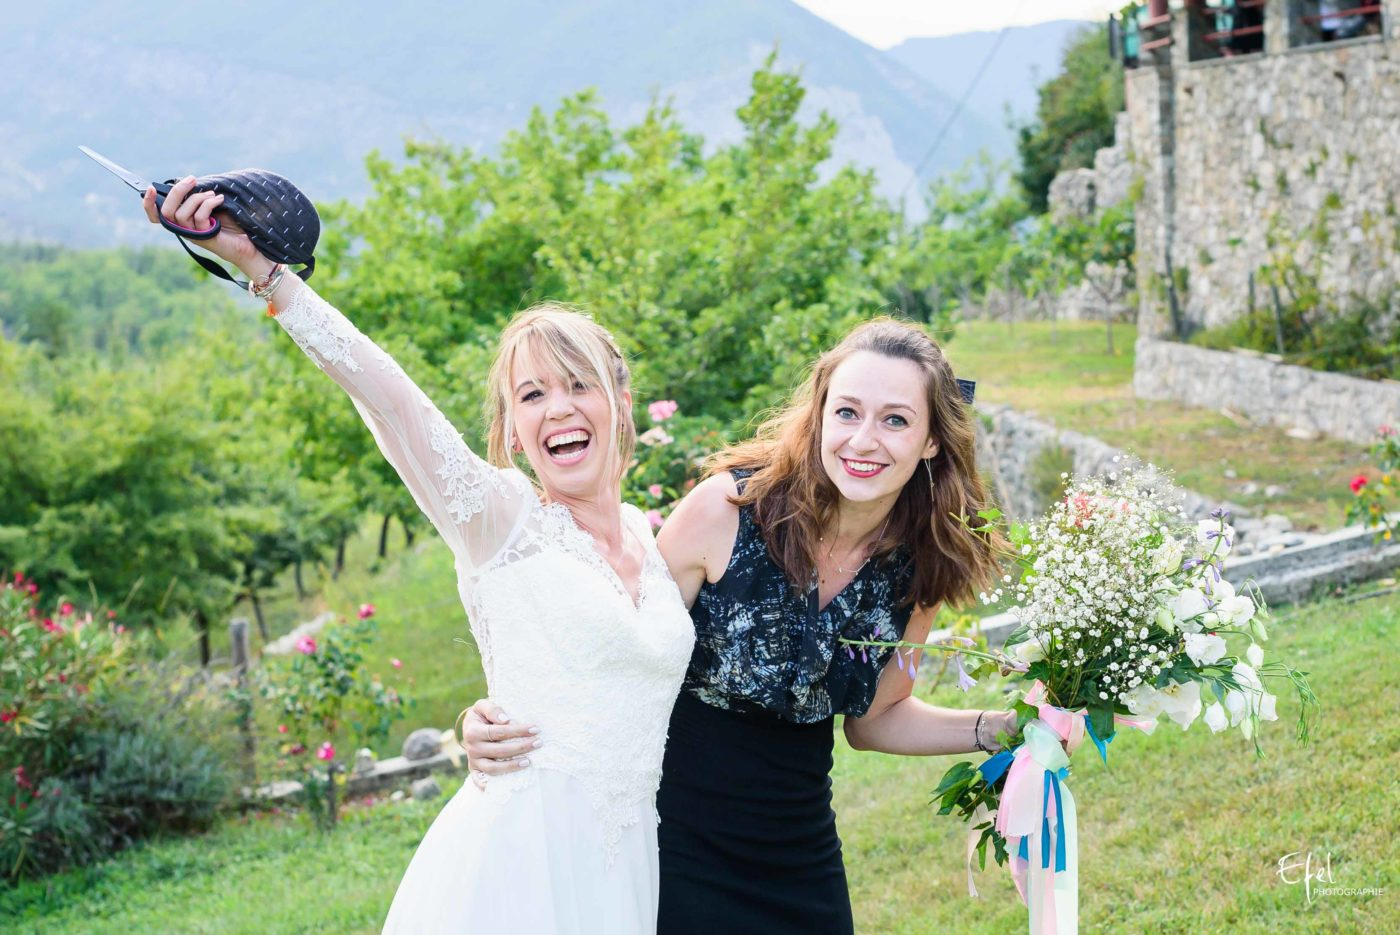 vive la future mariée - photographe mariage hautes alpes